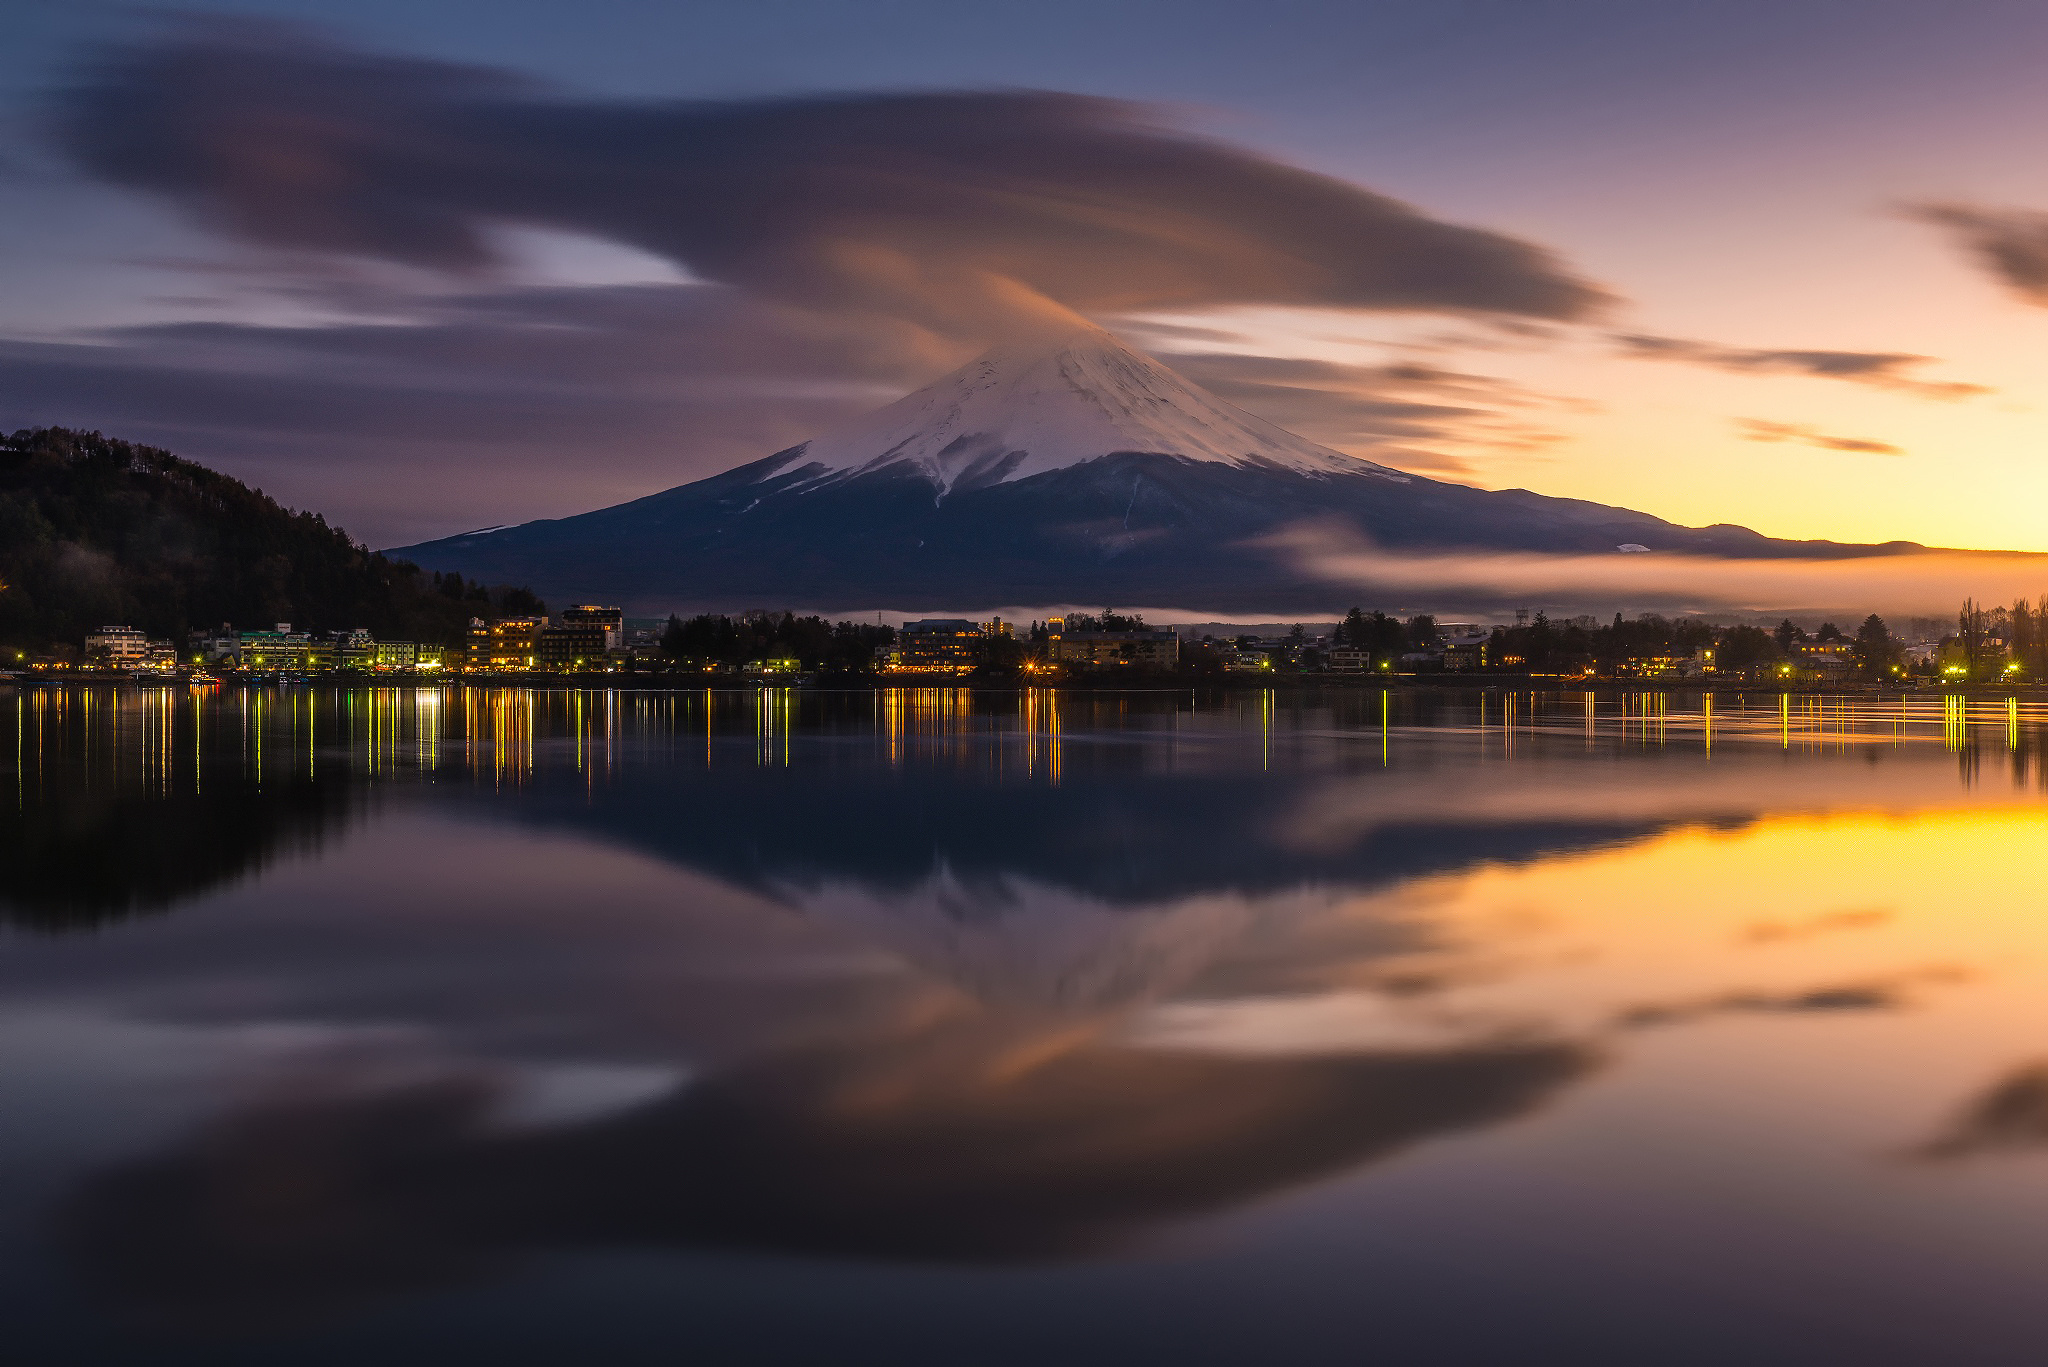 Mount Fuji Volcano Japan Reflection Yamanashi Lake Kawaguchi 2048x1367